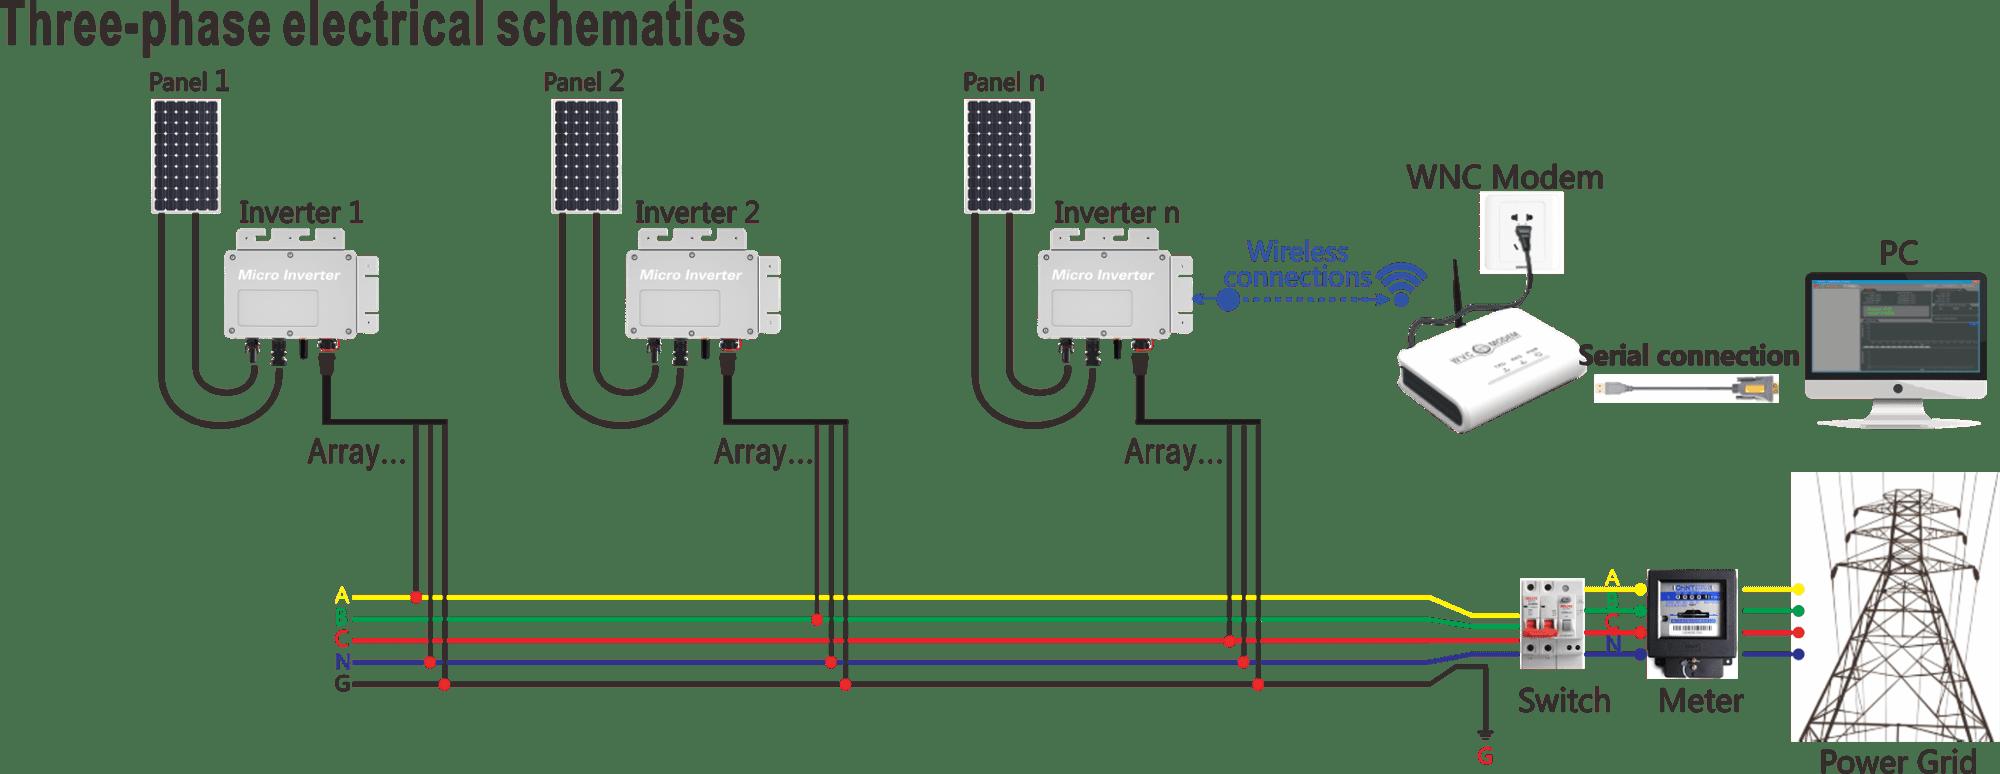 Wvc-300 Grid Tie Solar Inverter For 300w Solar Panel Ip65